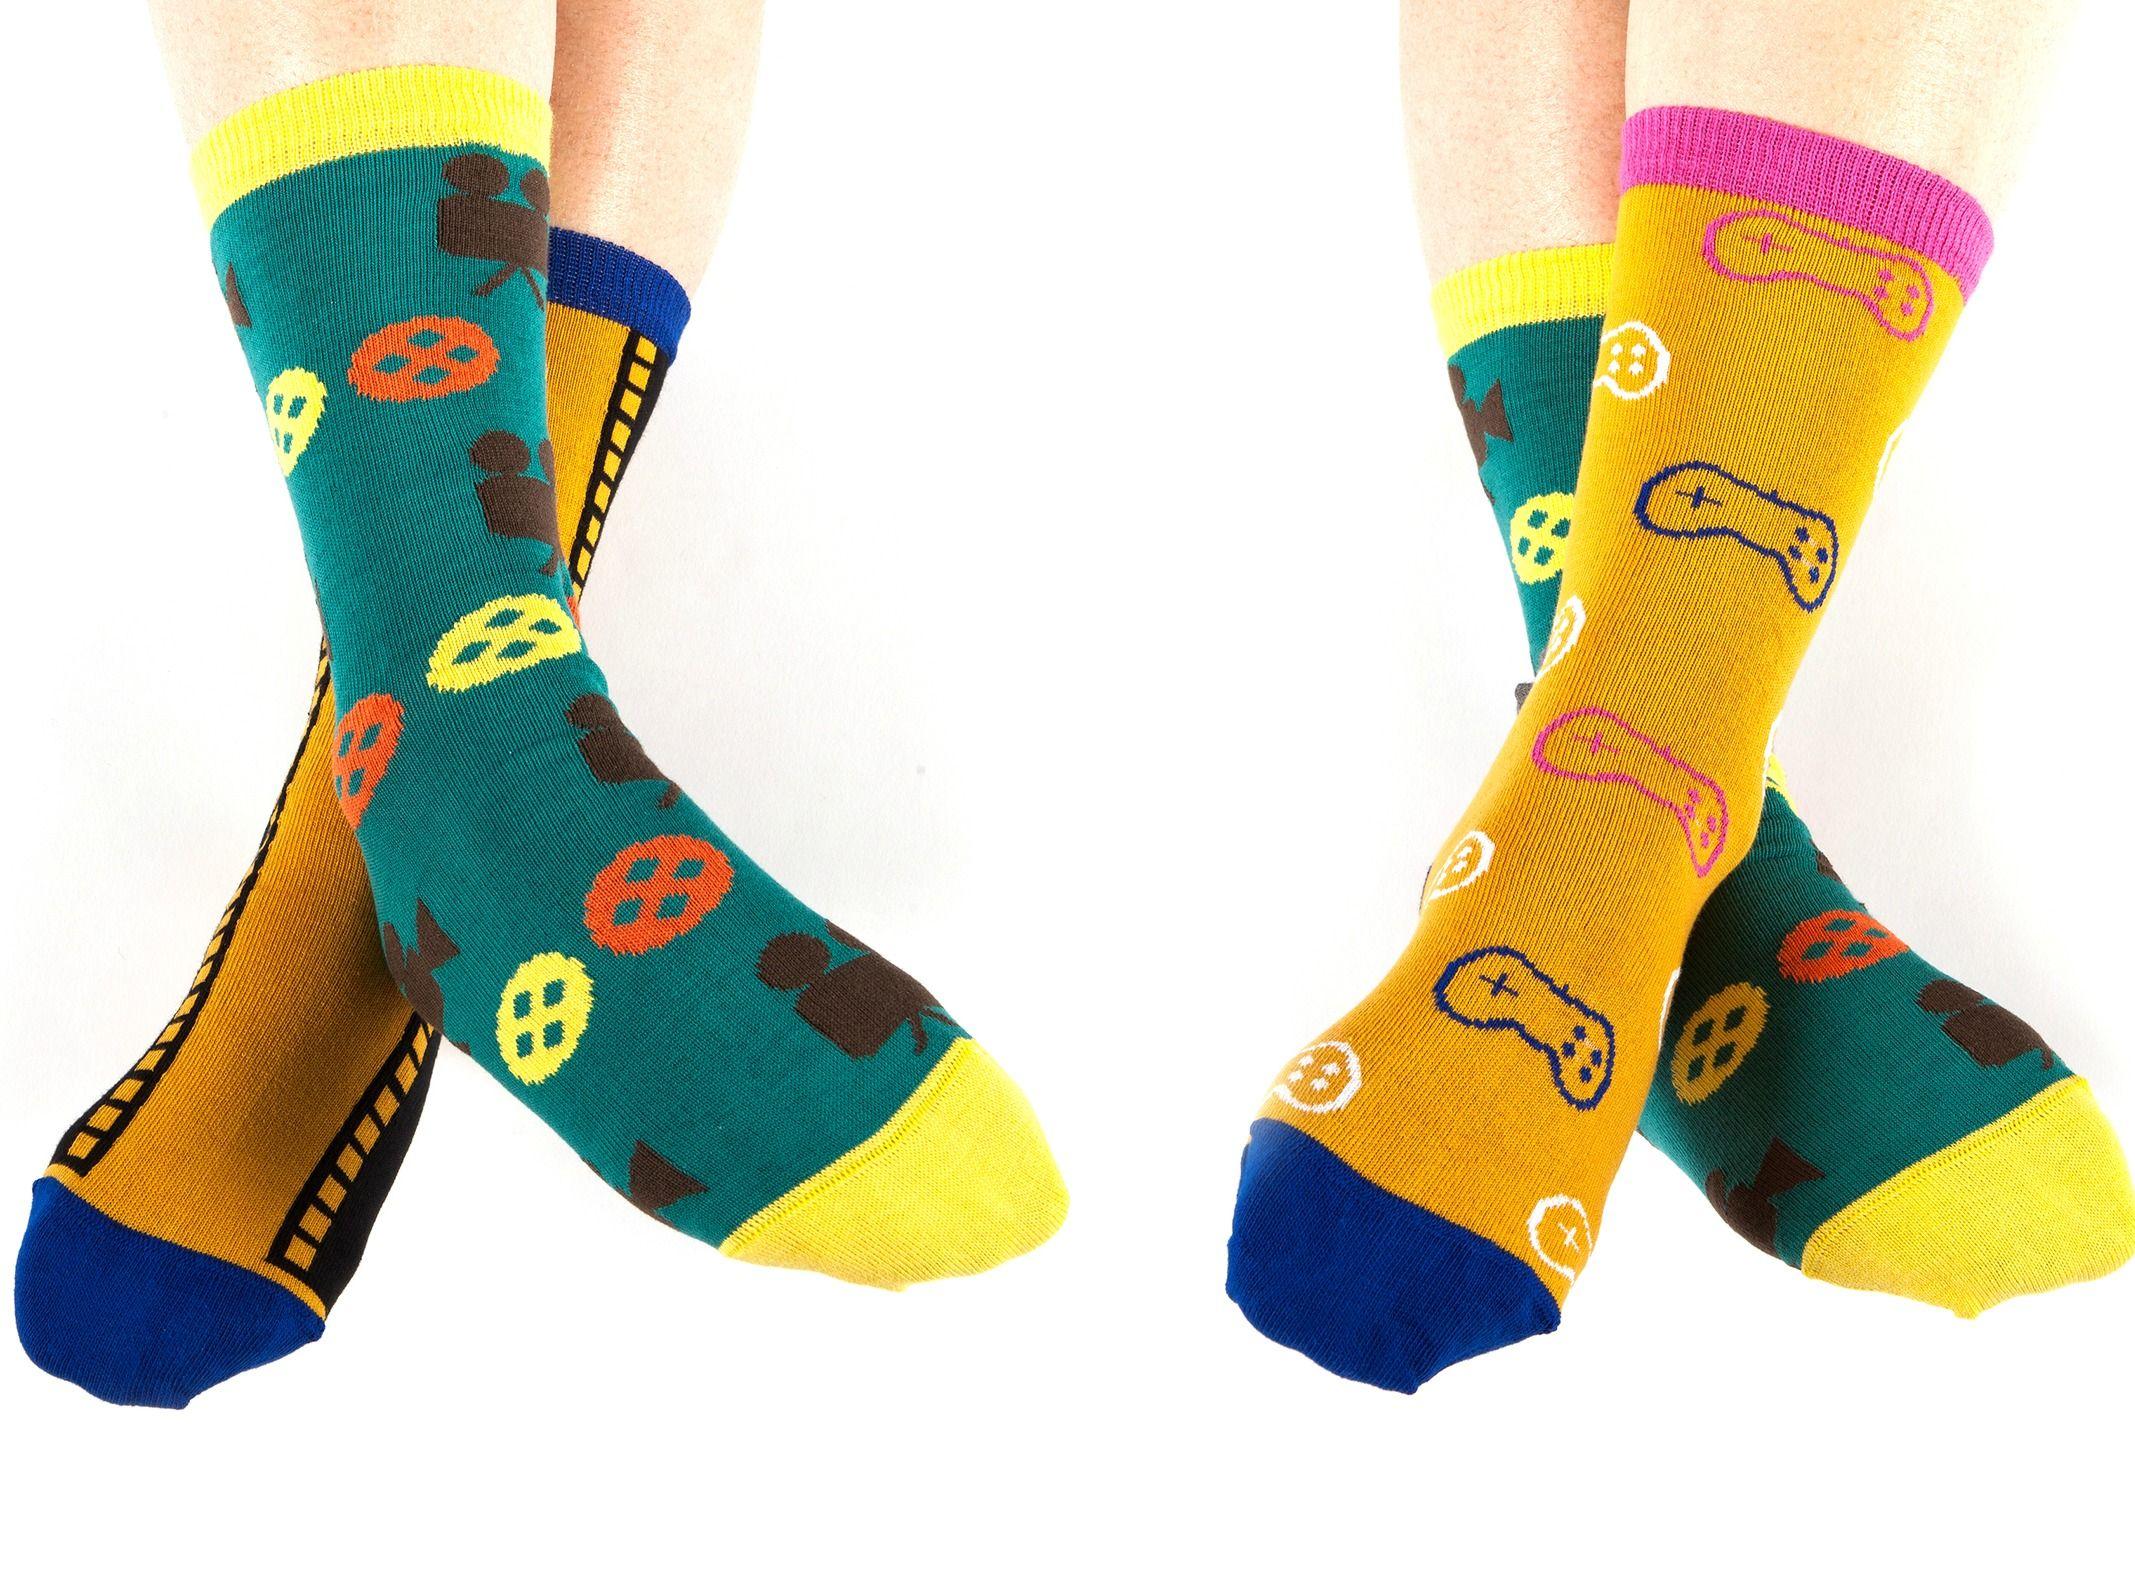 ACMI Sock Giveaway